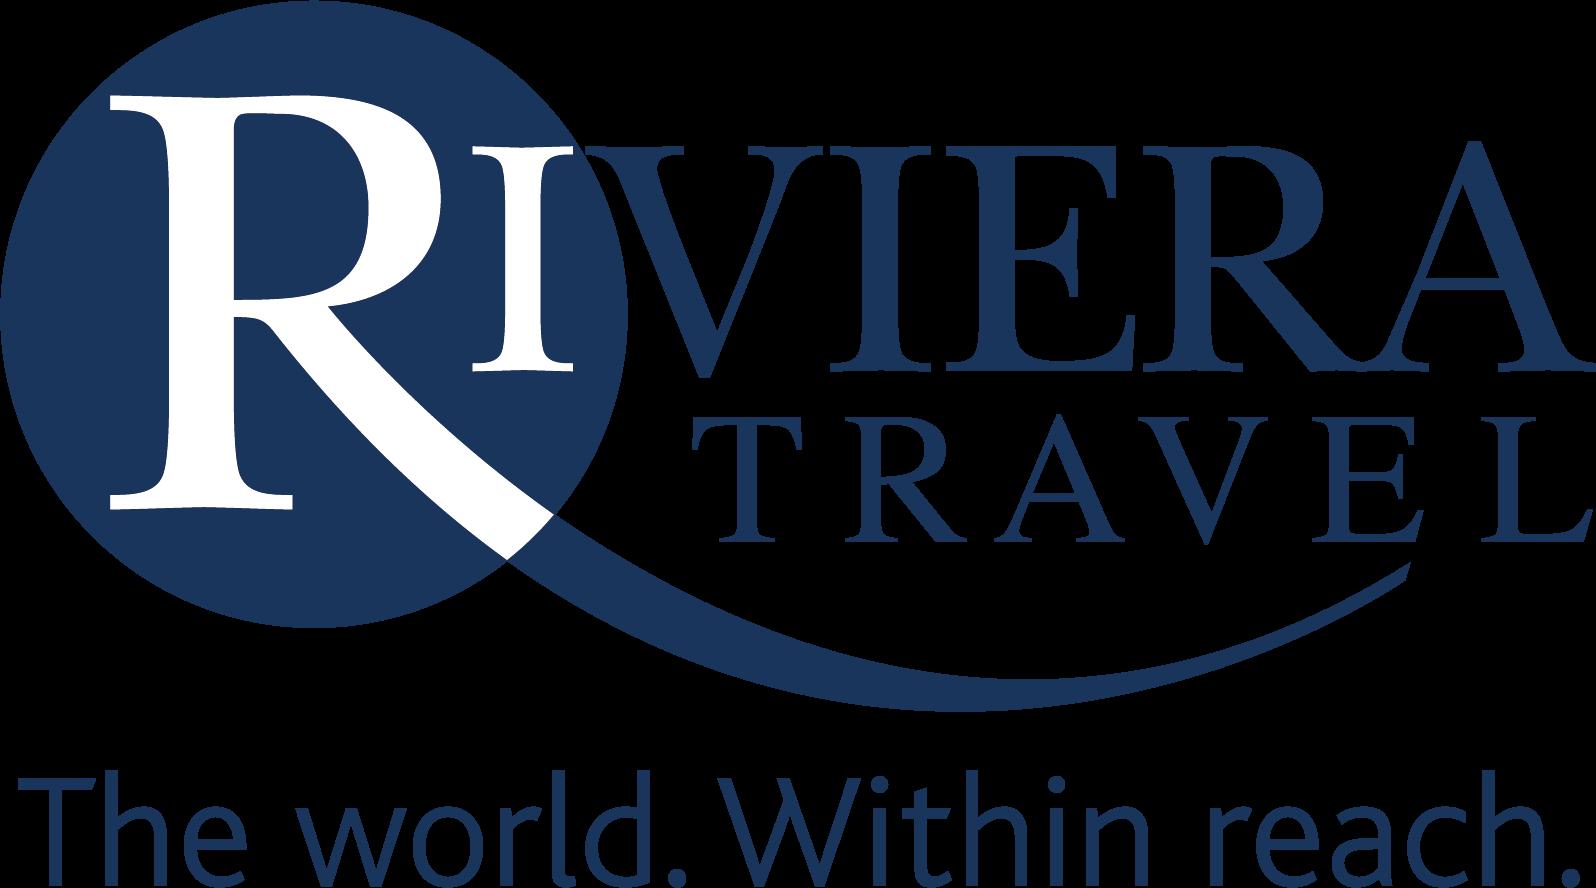 RivieraLogo_TWWR_April2017_BLUE.png